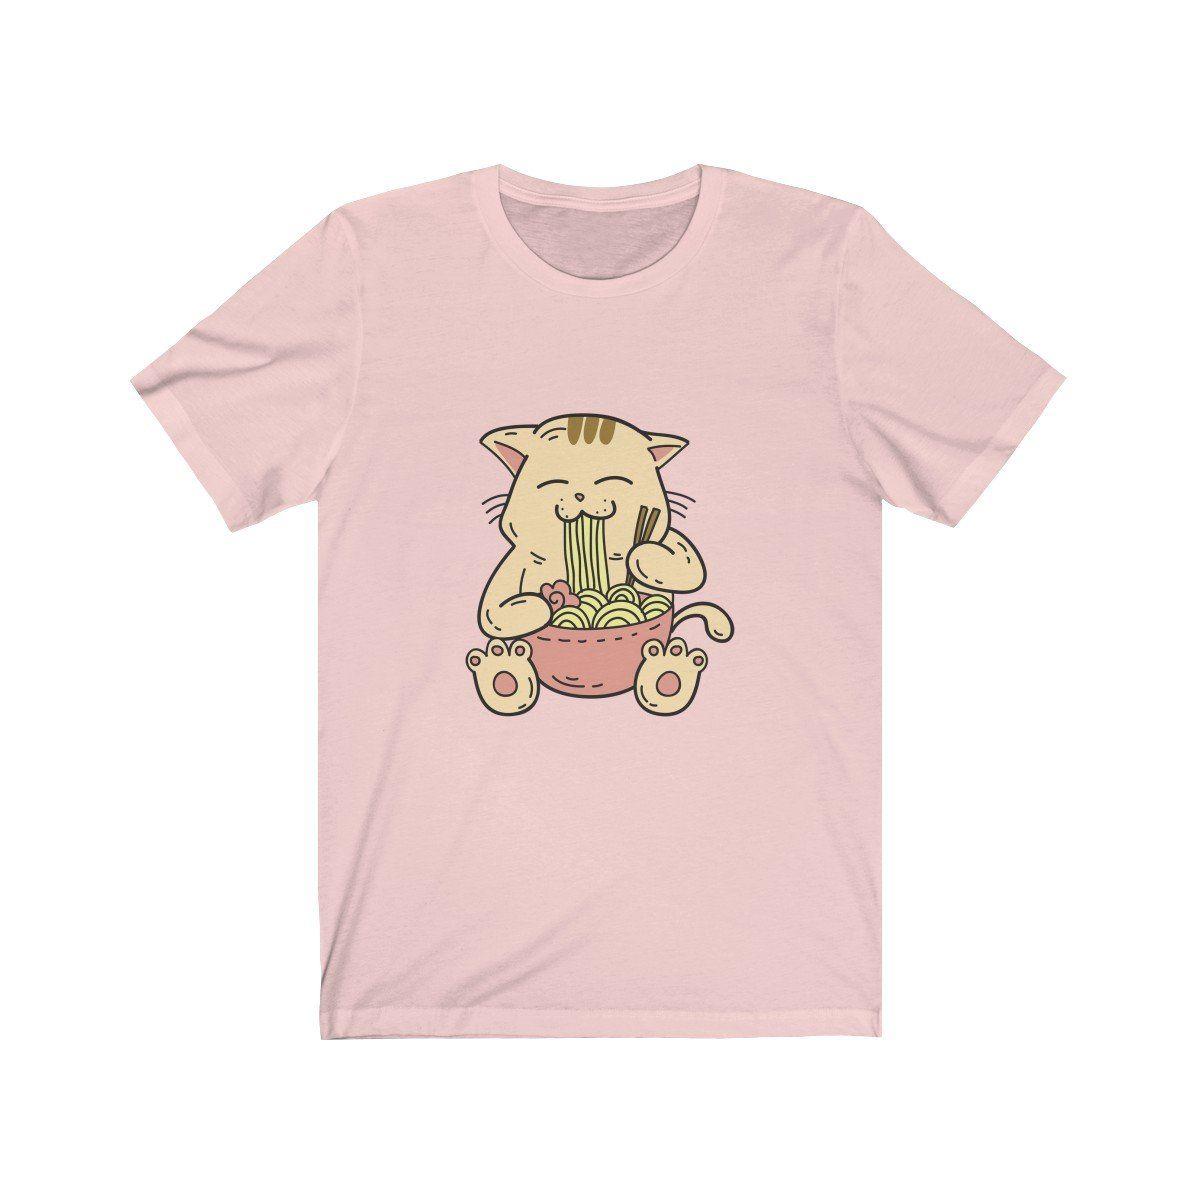 Cute kawaii japanese anime cat eating ramen with